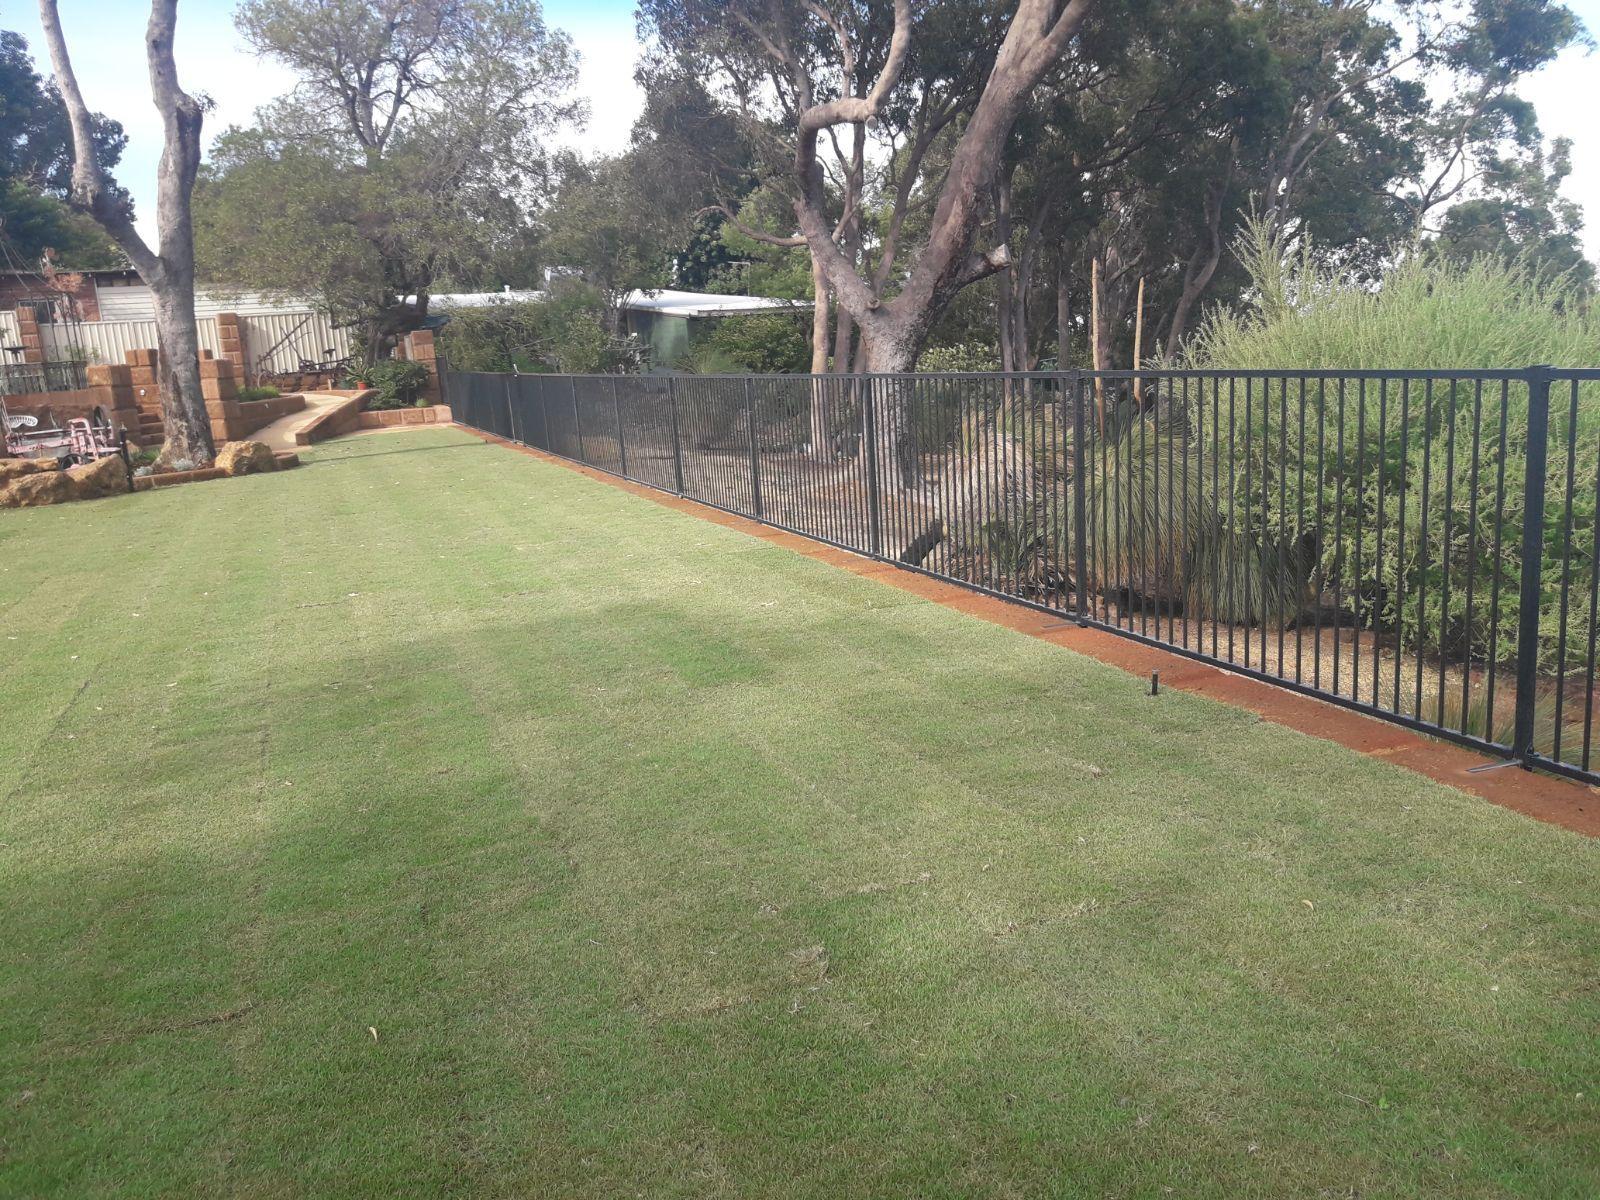 Glass Pool Fencing Perth Wa Frameless Glass Aluminum Pool Fence In 2020 Glass Pool Aluminum Pool Fence Glass Pool Fencing